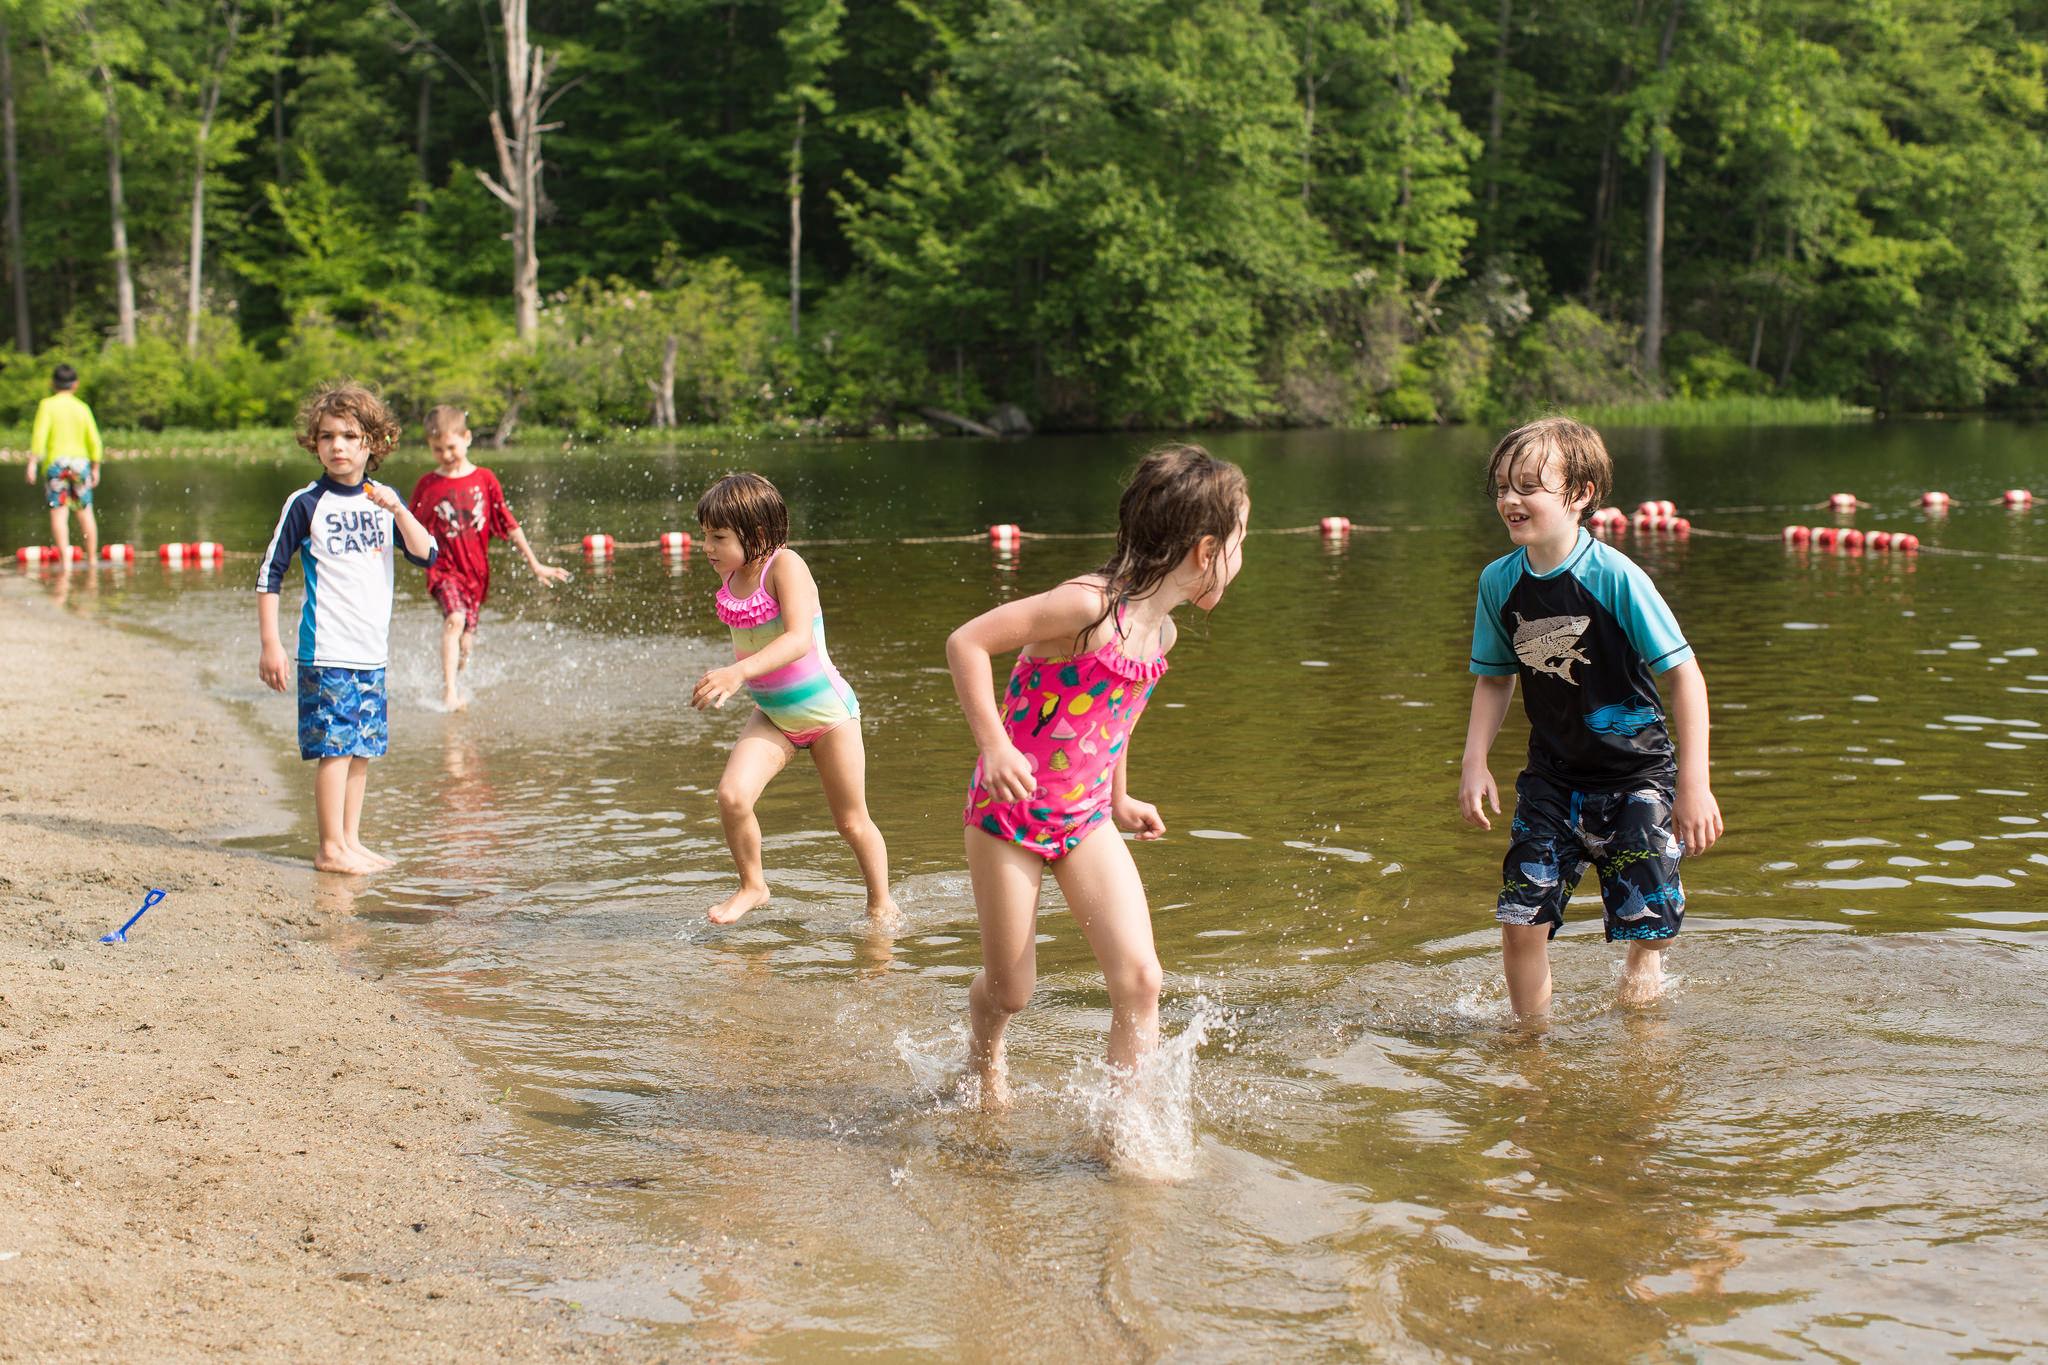 Children enjoy the water at Redding's Topstone Park.